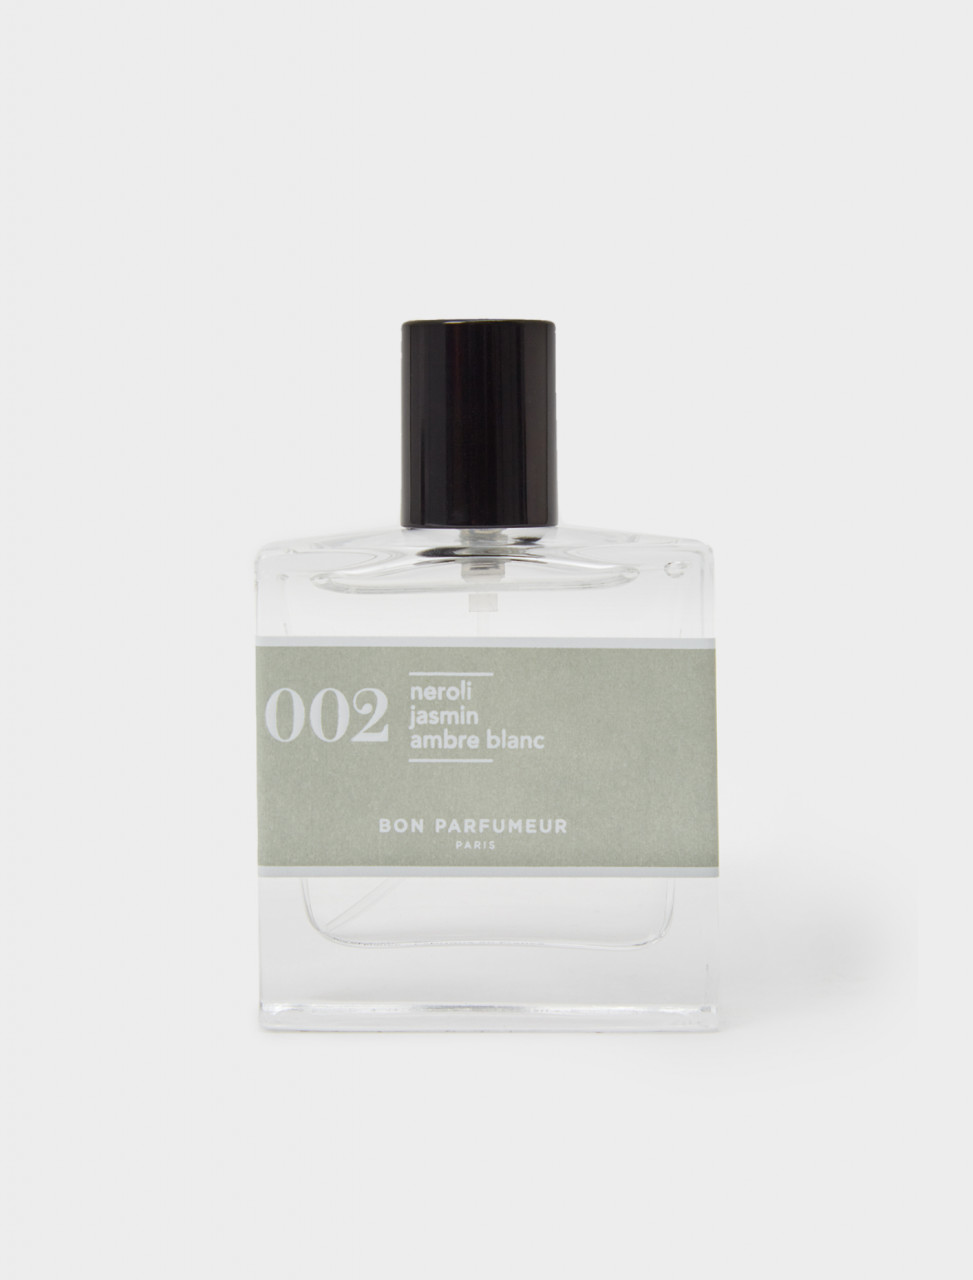 Front view of Bon Parfumeur n#002 30 ml perfume bottle (Neroli, Jasmine, White Amber)